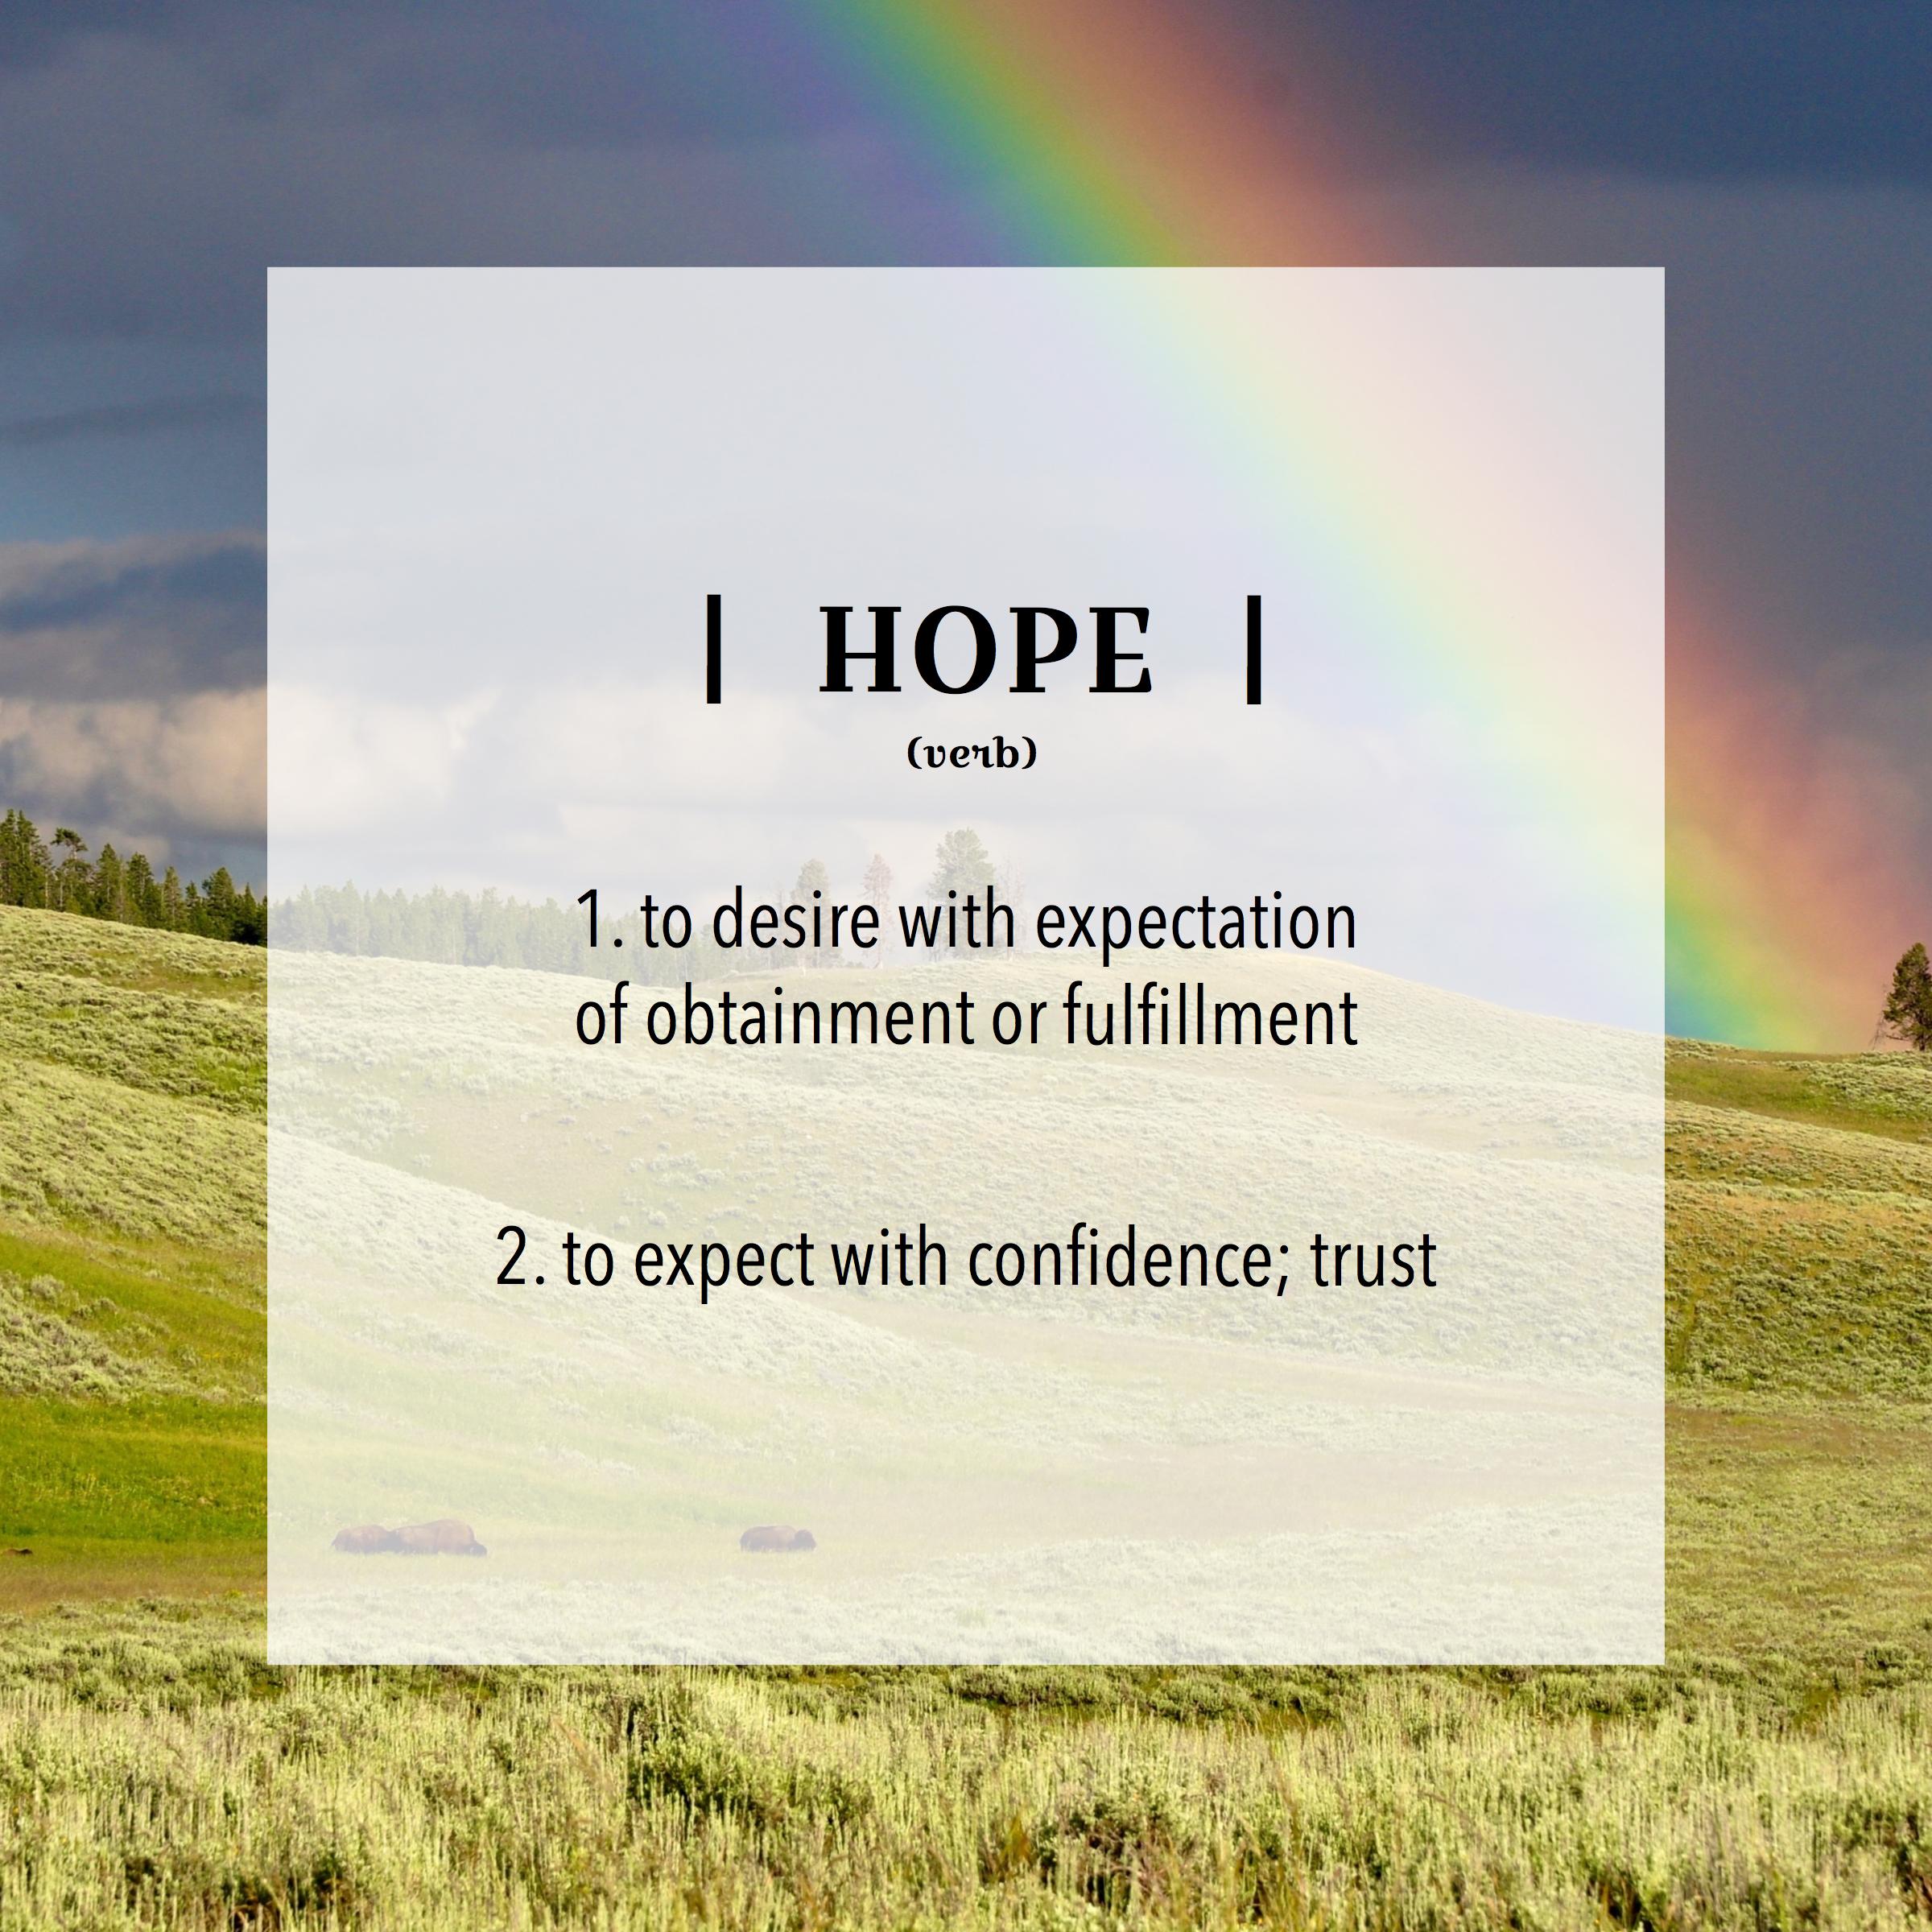 Hope Definition.jpg